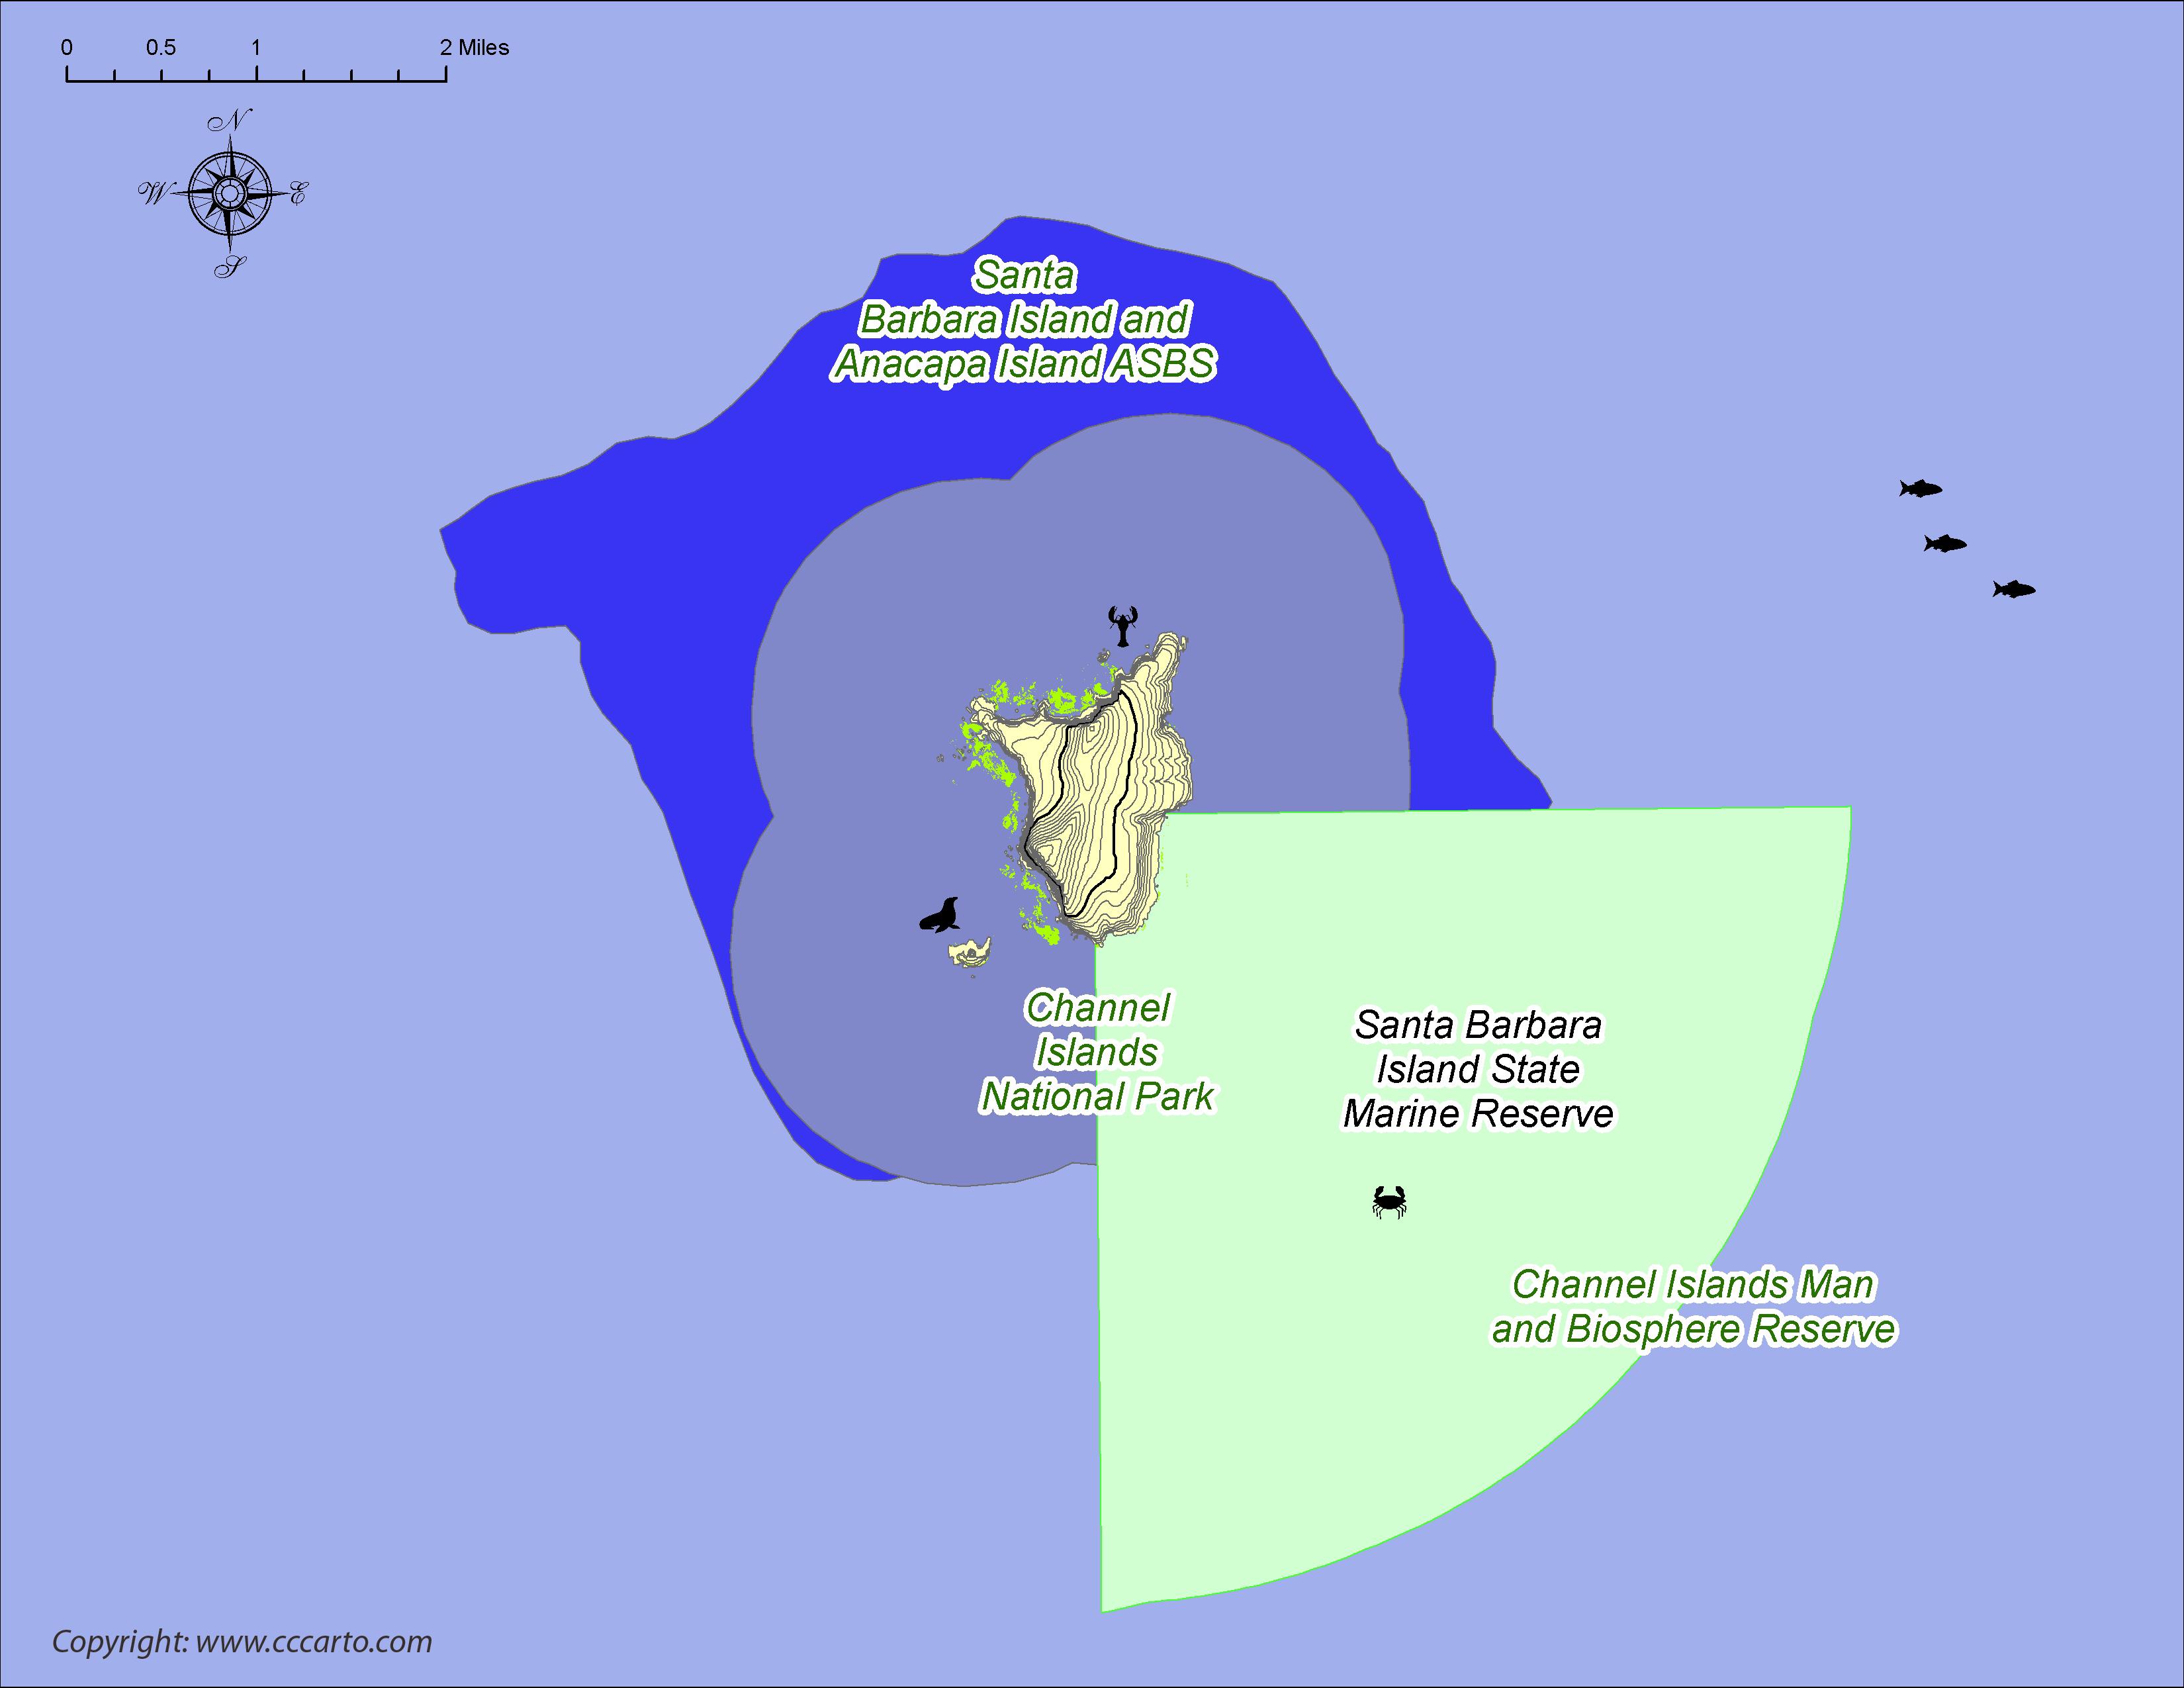 Santa Barbara Island Reserves